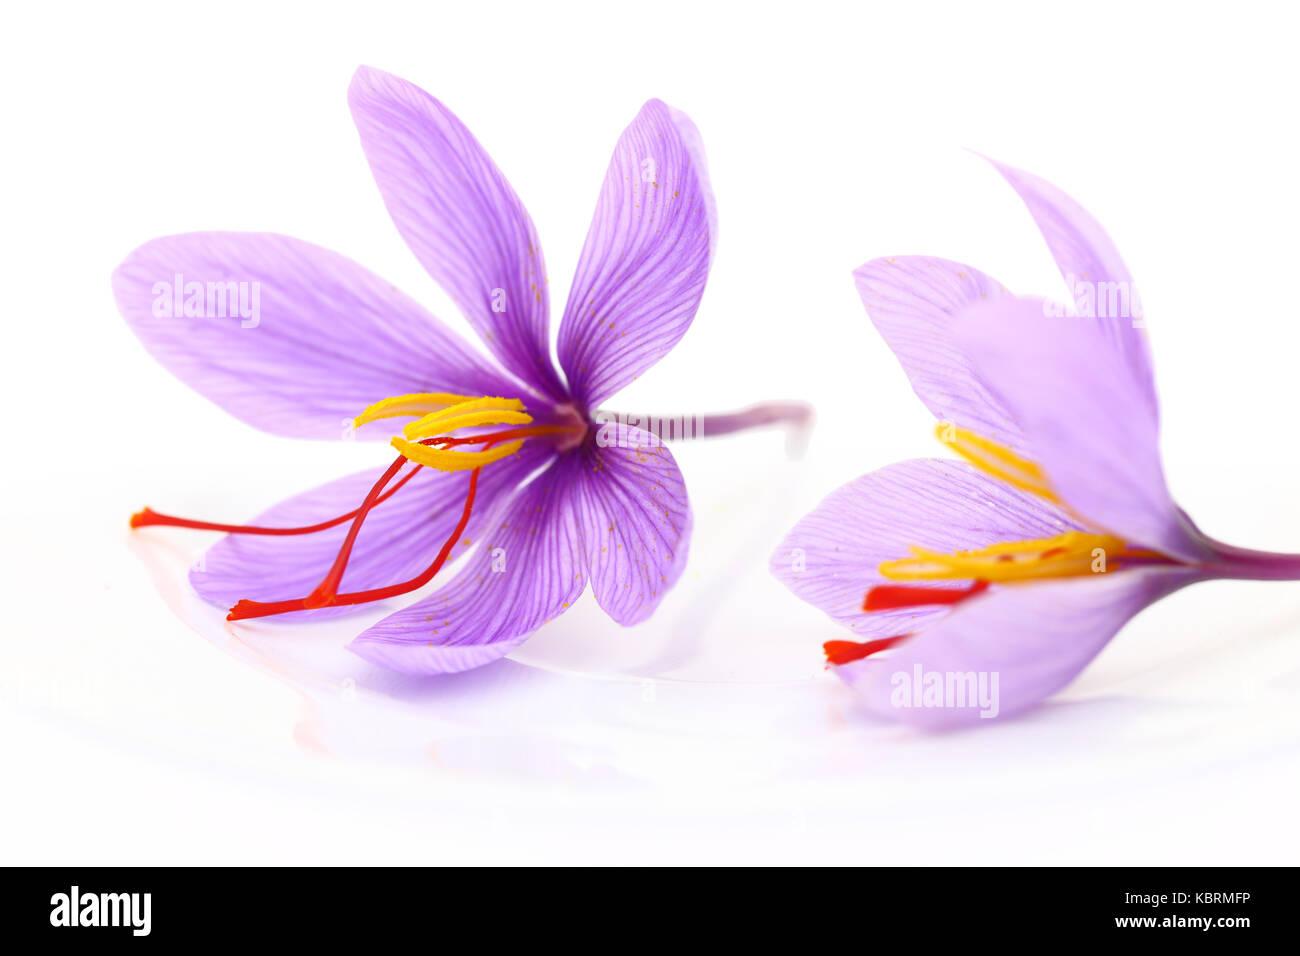 Close up of saffron flowers - Stock Image